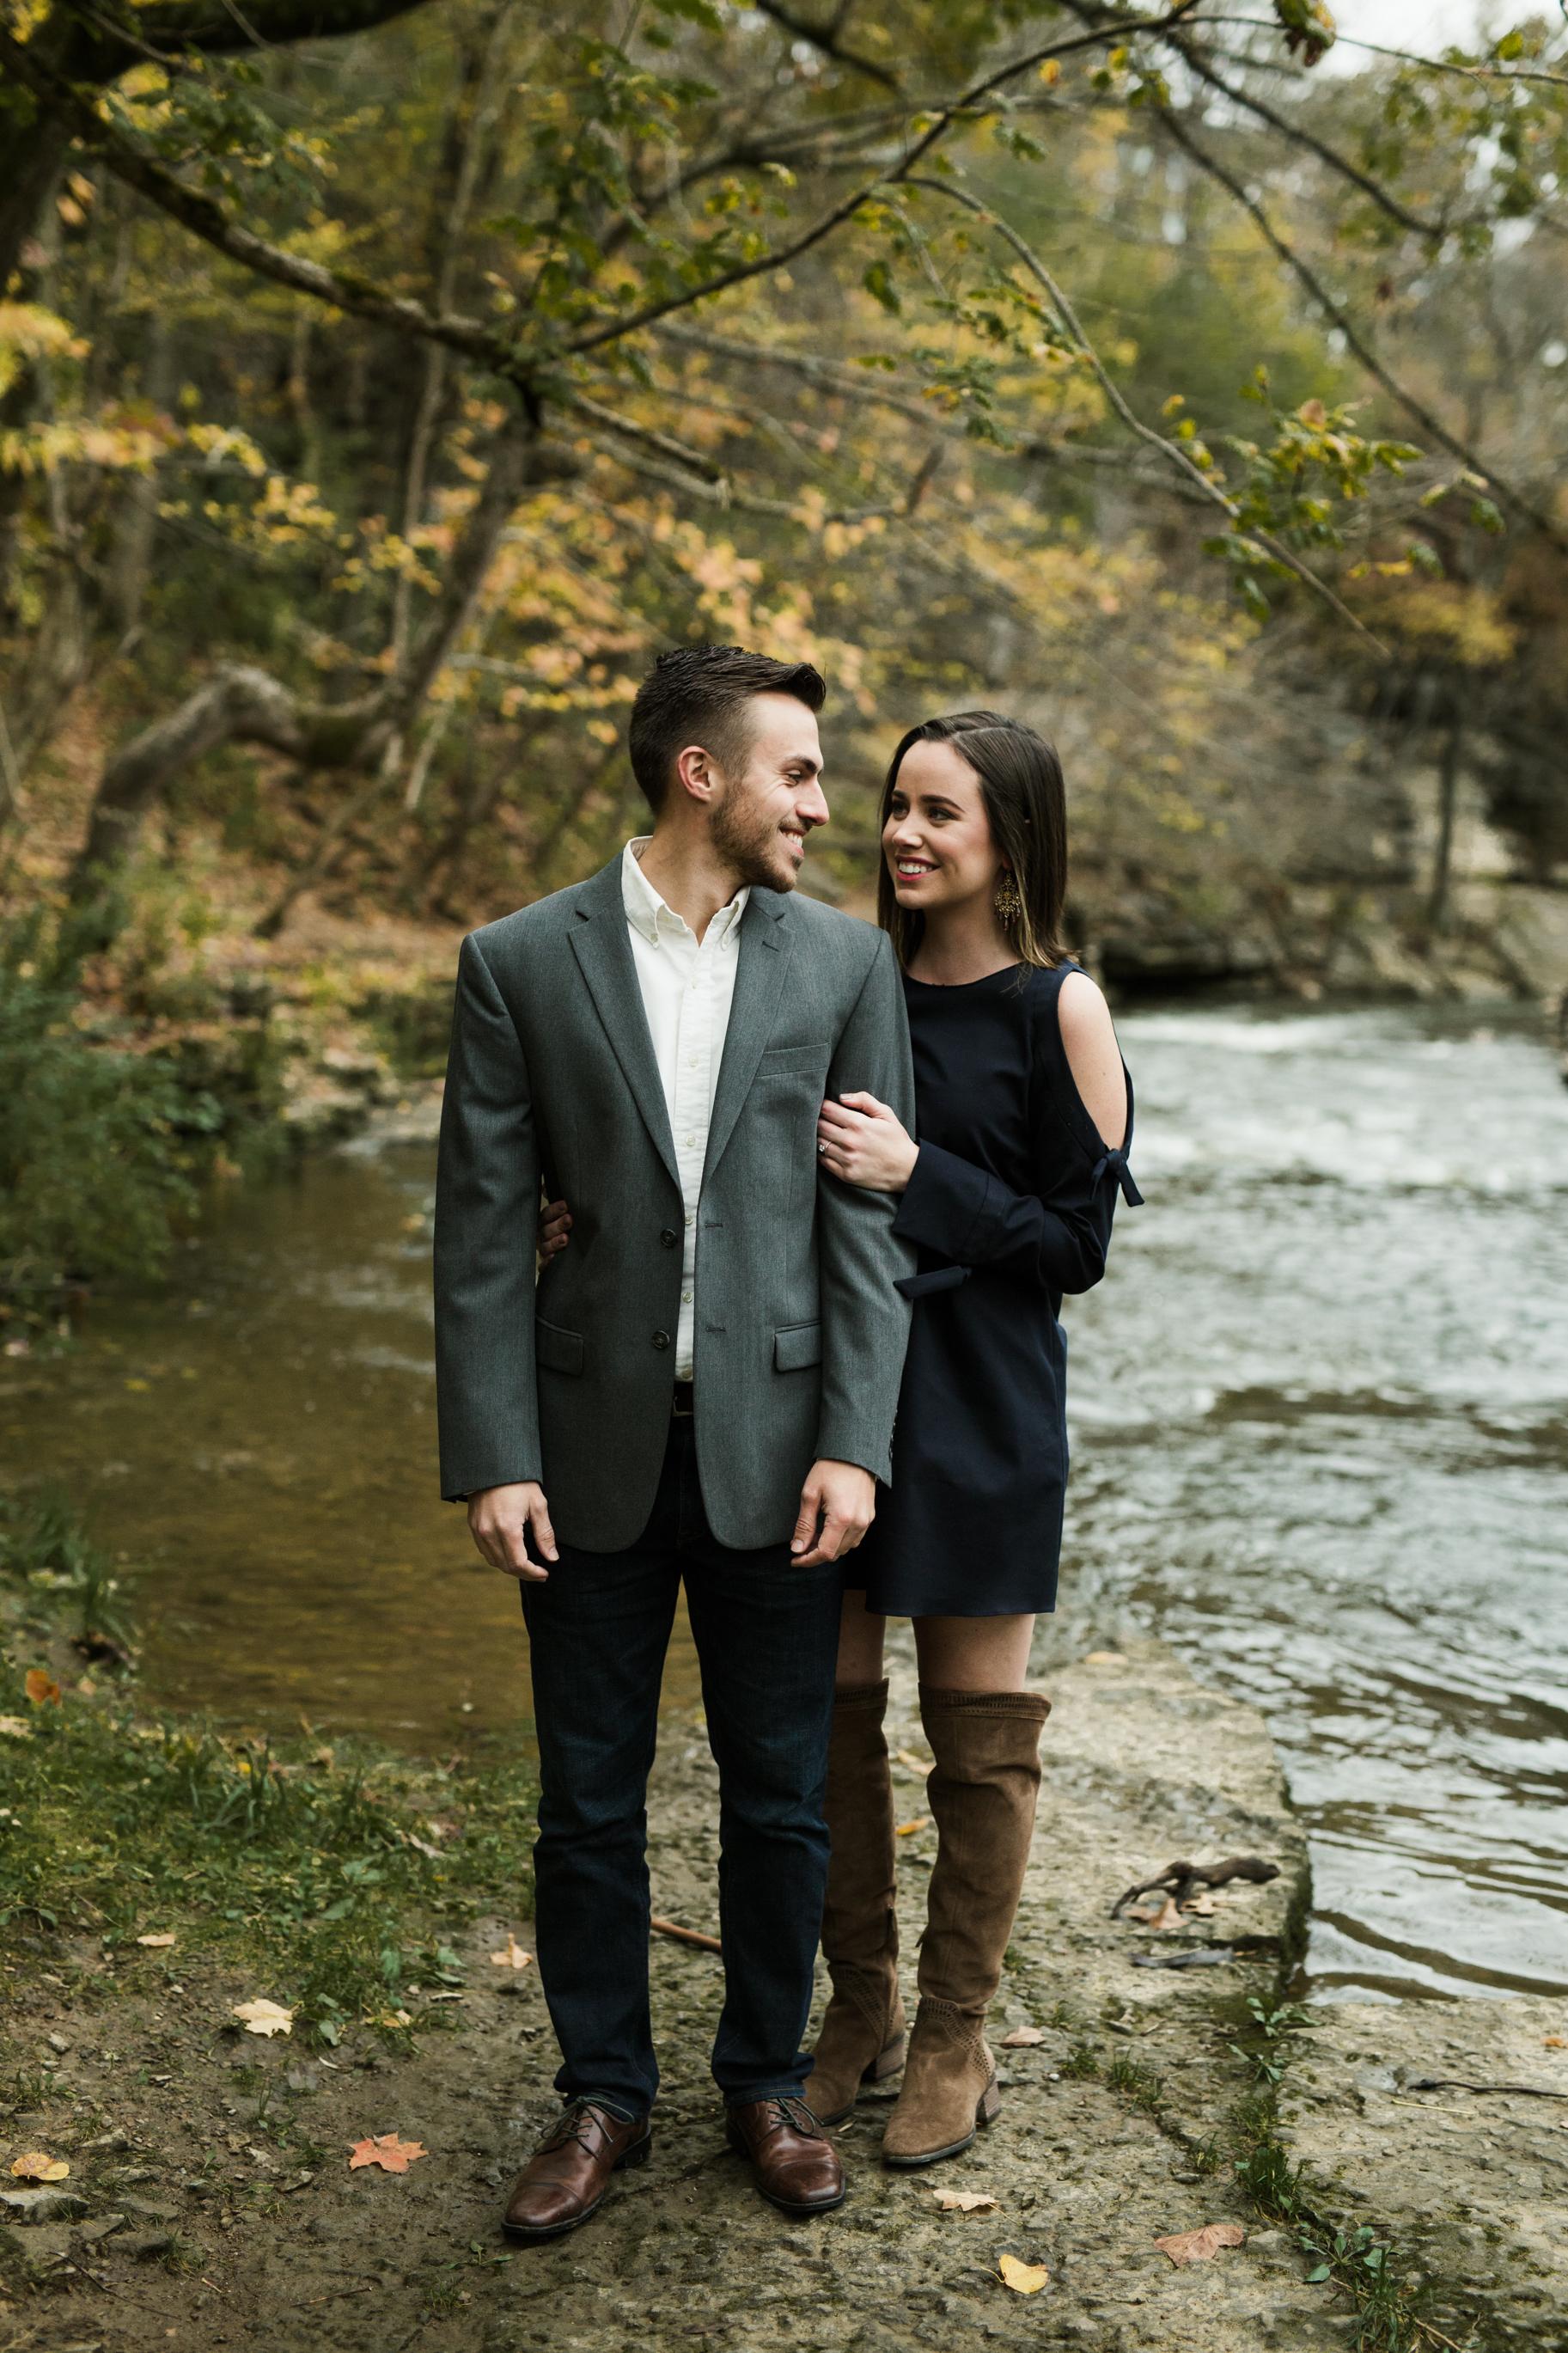 Kelsey and Daniel Engagement 2018 Crystal Ludwick Photo Louisville Wedding Photographer Kentucky Wedding Photographer (26 of 31).jpg